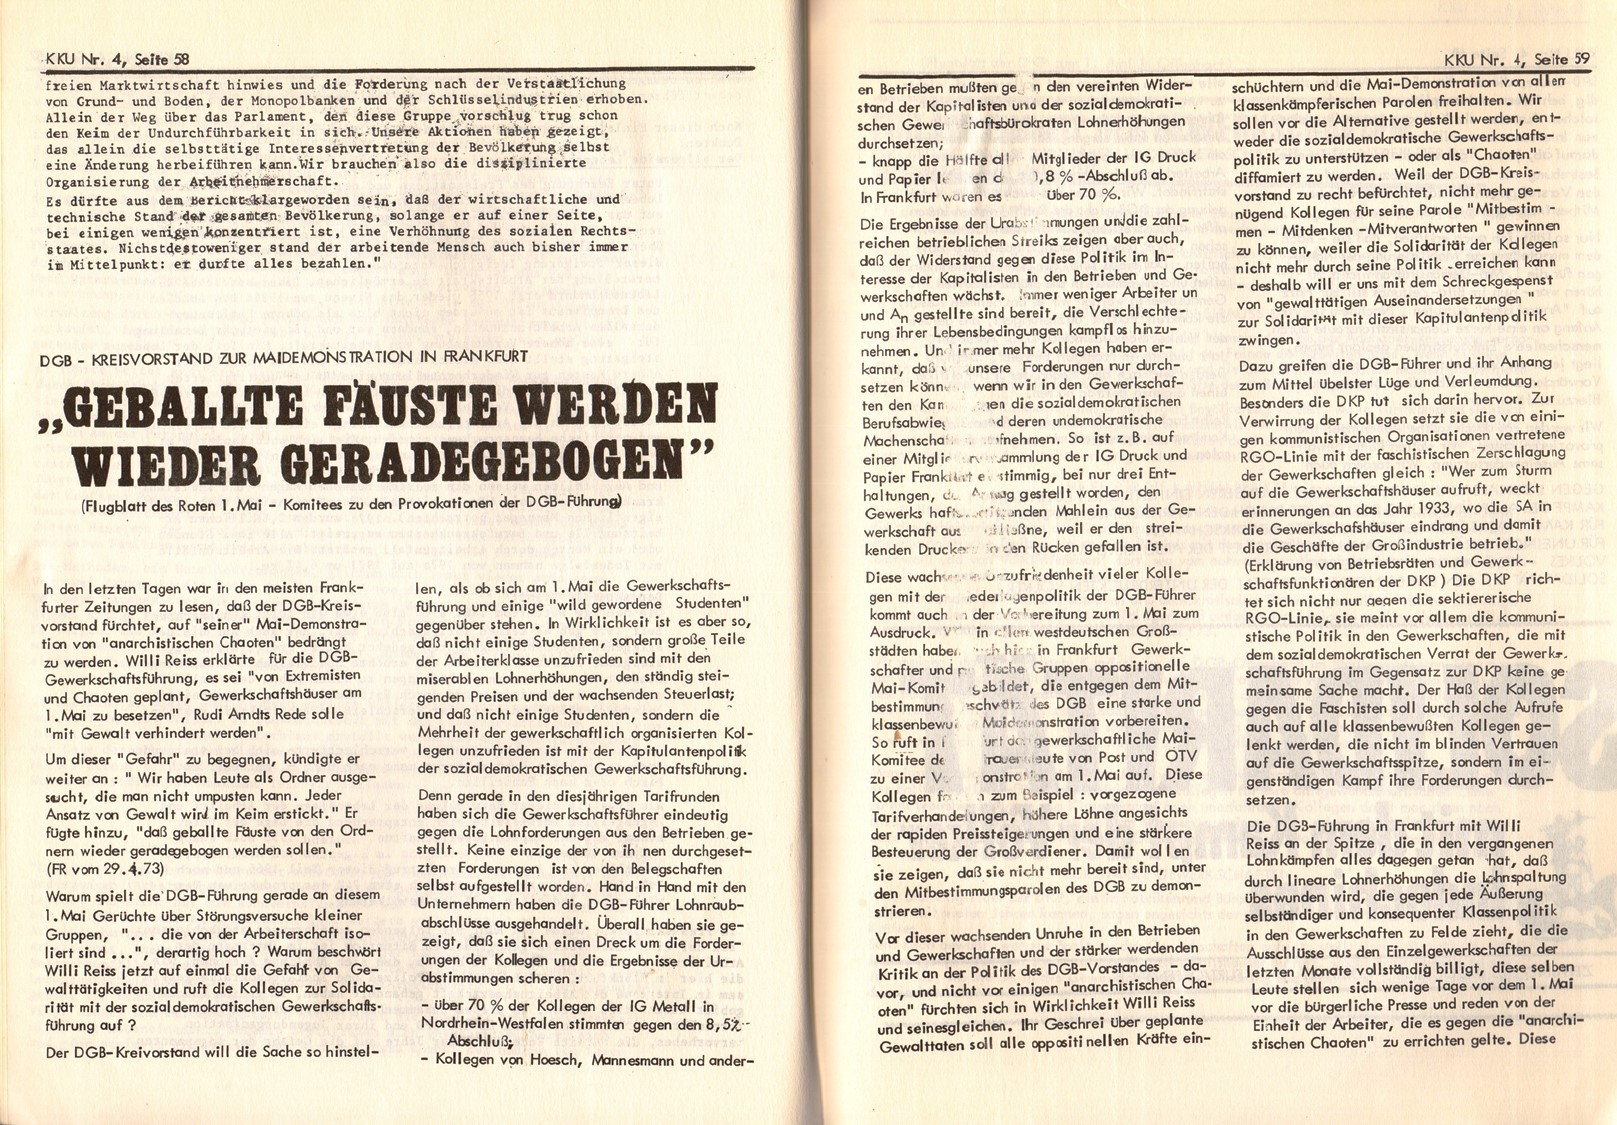 Frankfurt_Offenbach_KG_Kampf_Kritik_Umgestaltung_1973_04_05_30